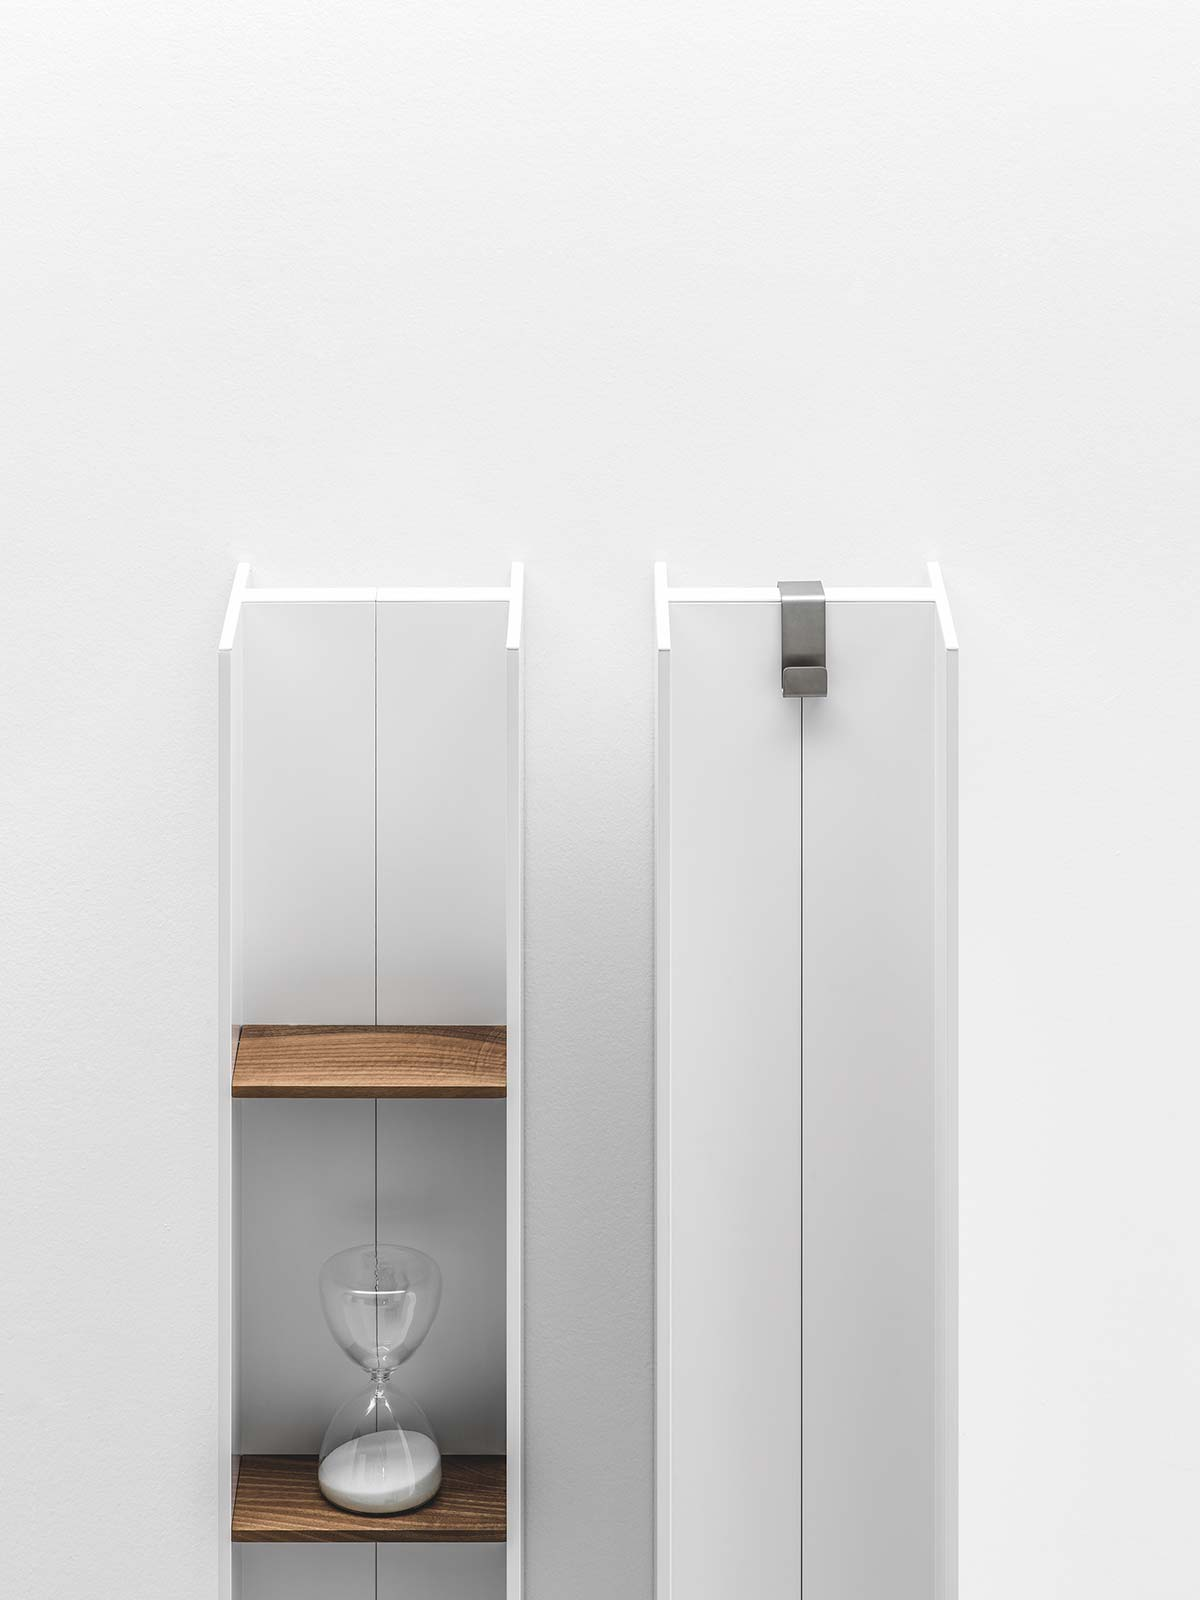 Serie T by Antrax IT - Design Matteo Thun & Antonio Rodriguez